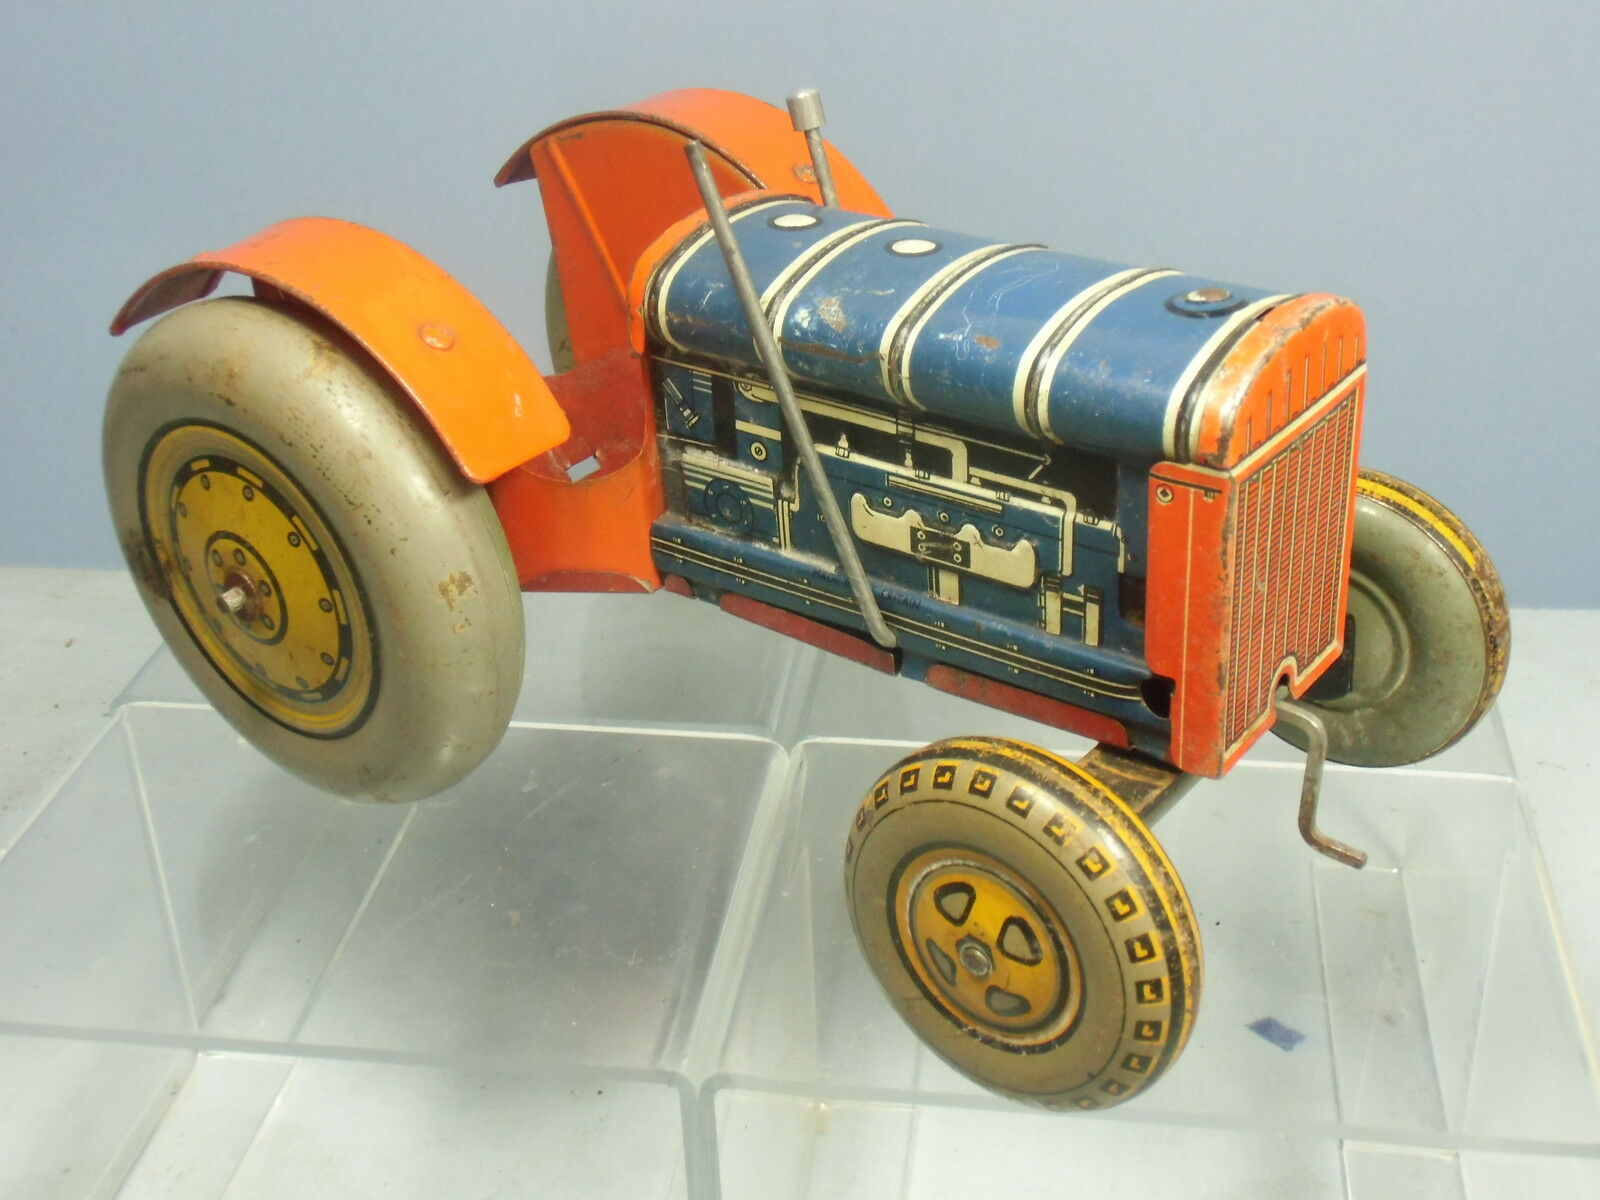 Vintage Hojalata MetJuguete Mecánica Modelo no. XXXX 10  Tractor